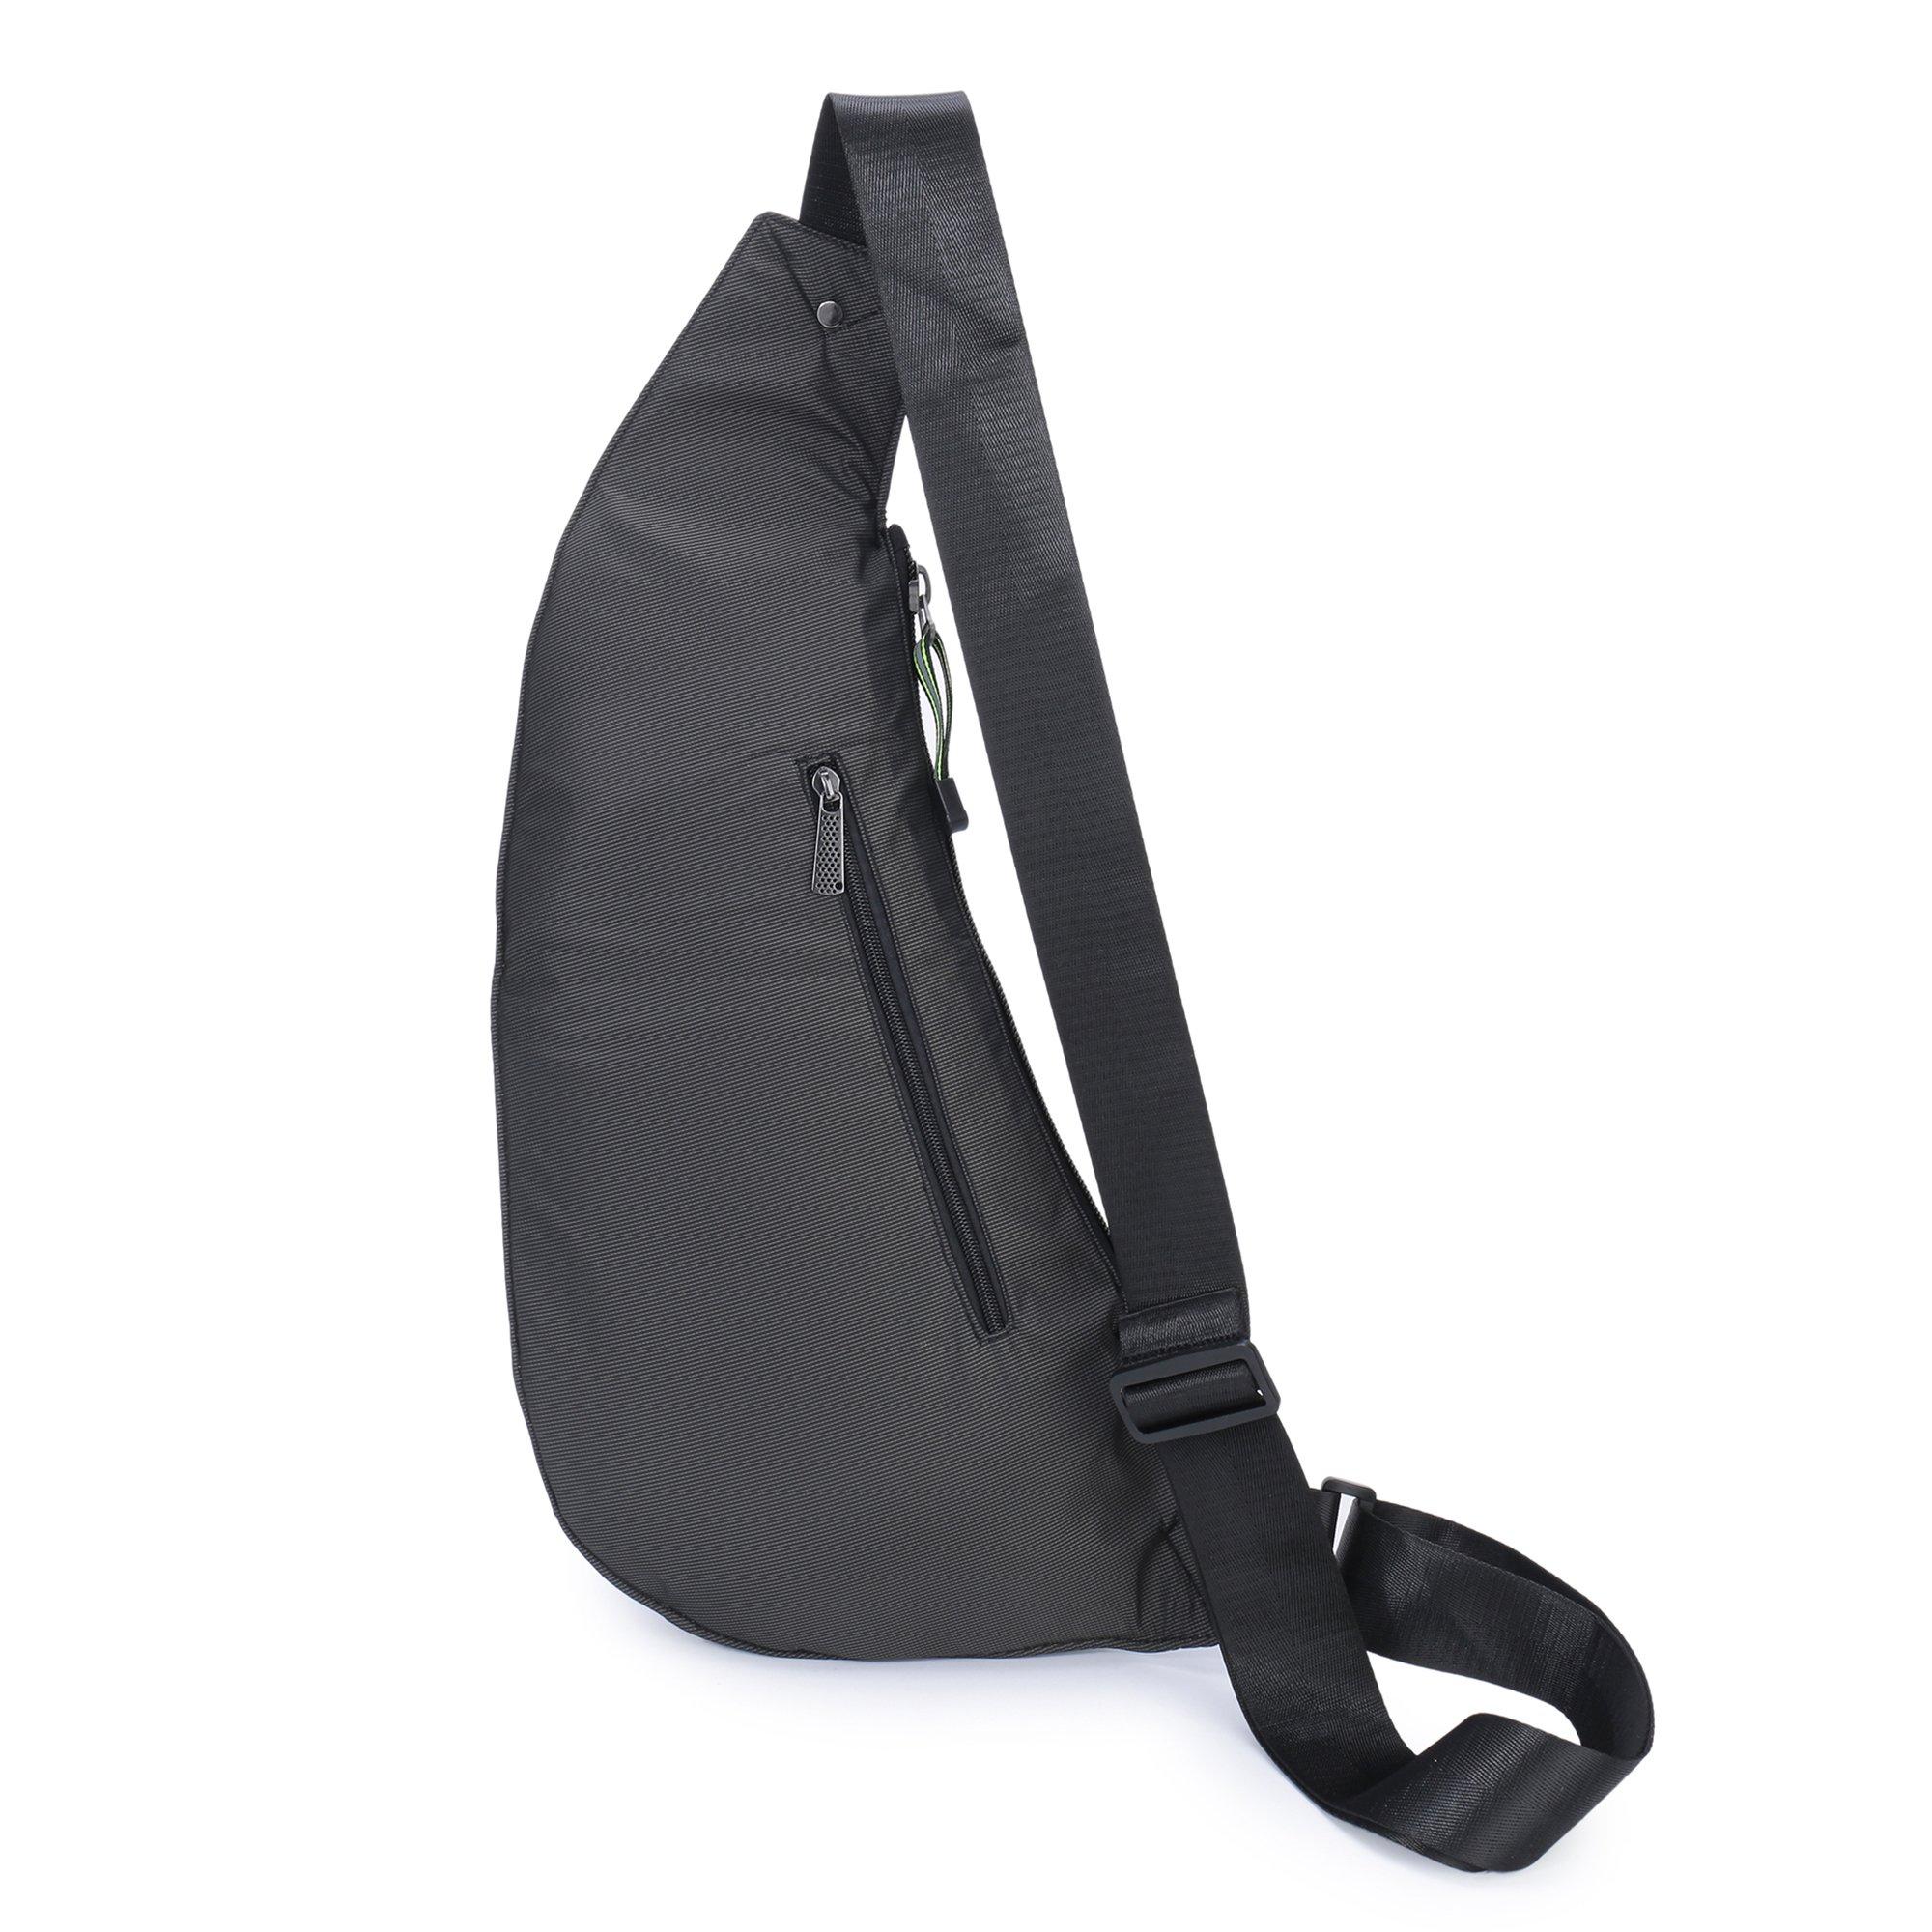 DDDH Sling Bags Shoulder Backpack Chest Pack Military Crossbody Bags For Man  Women (2627 Black) 7680e90e1b